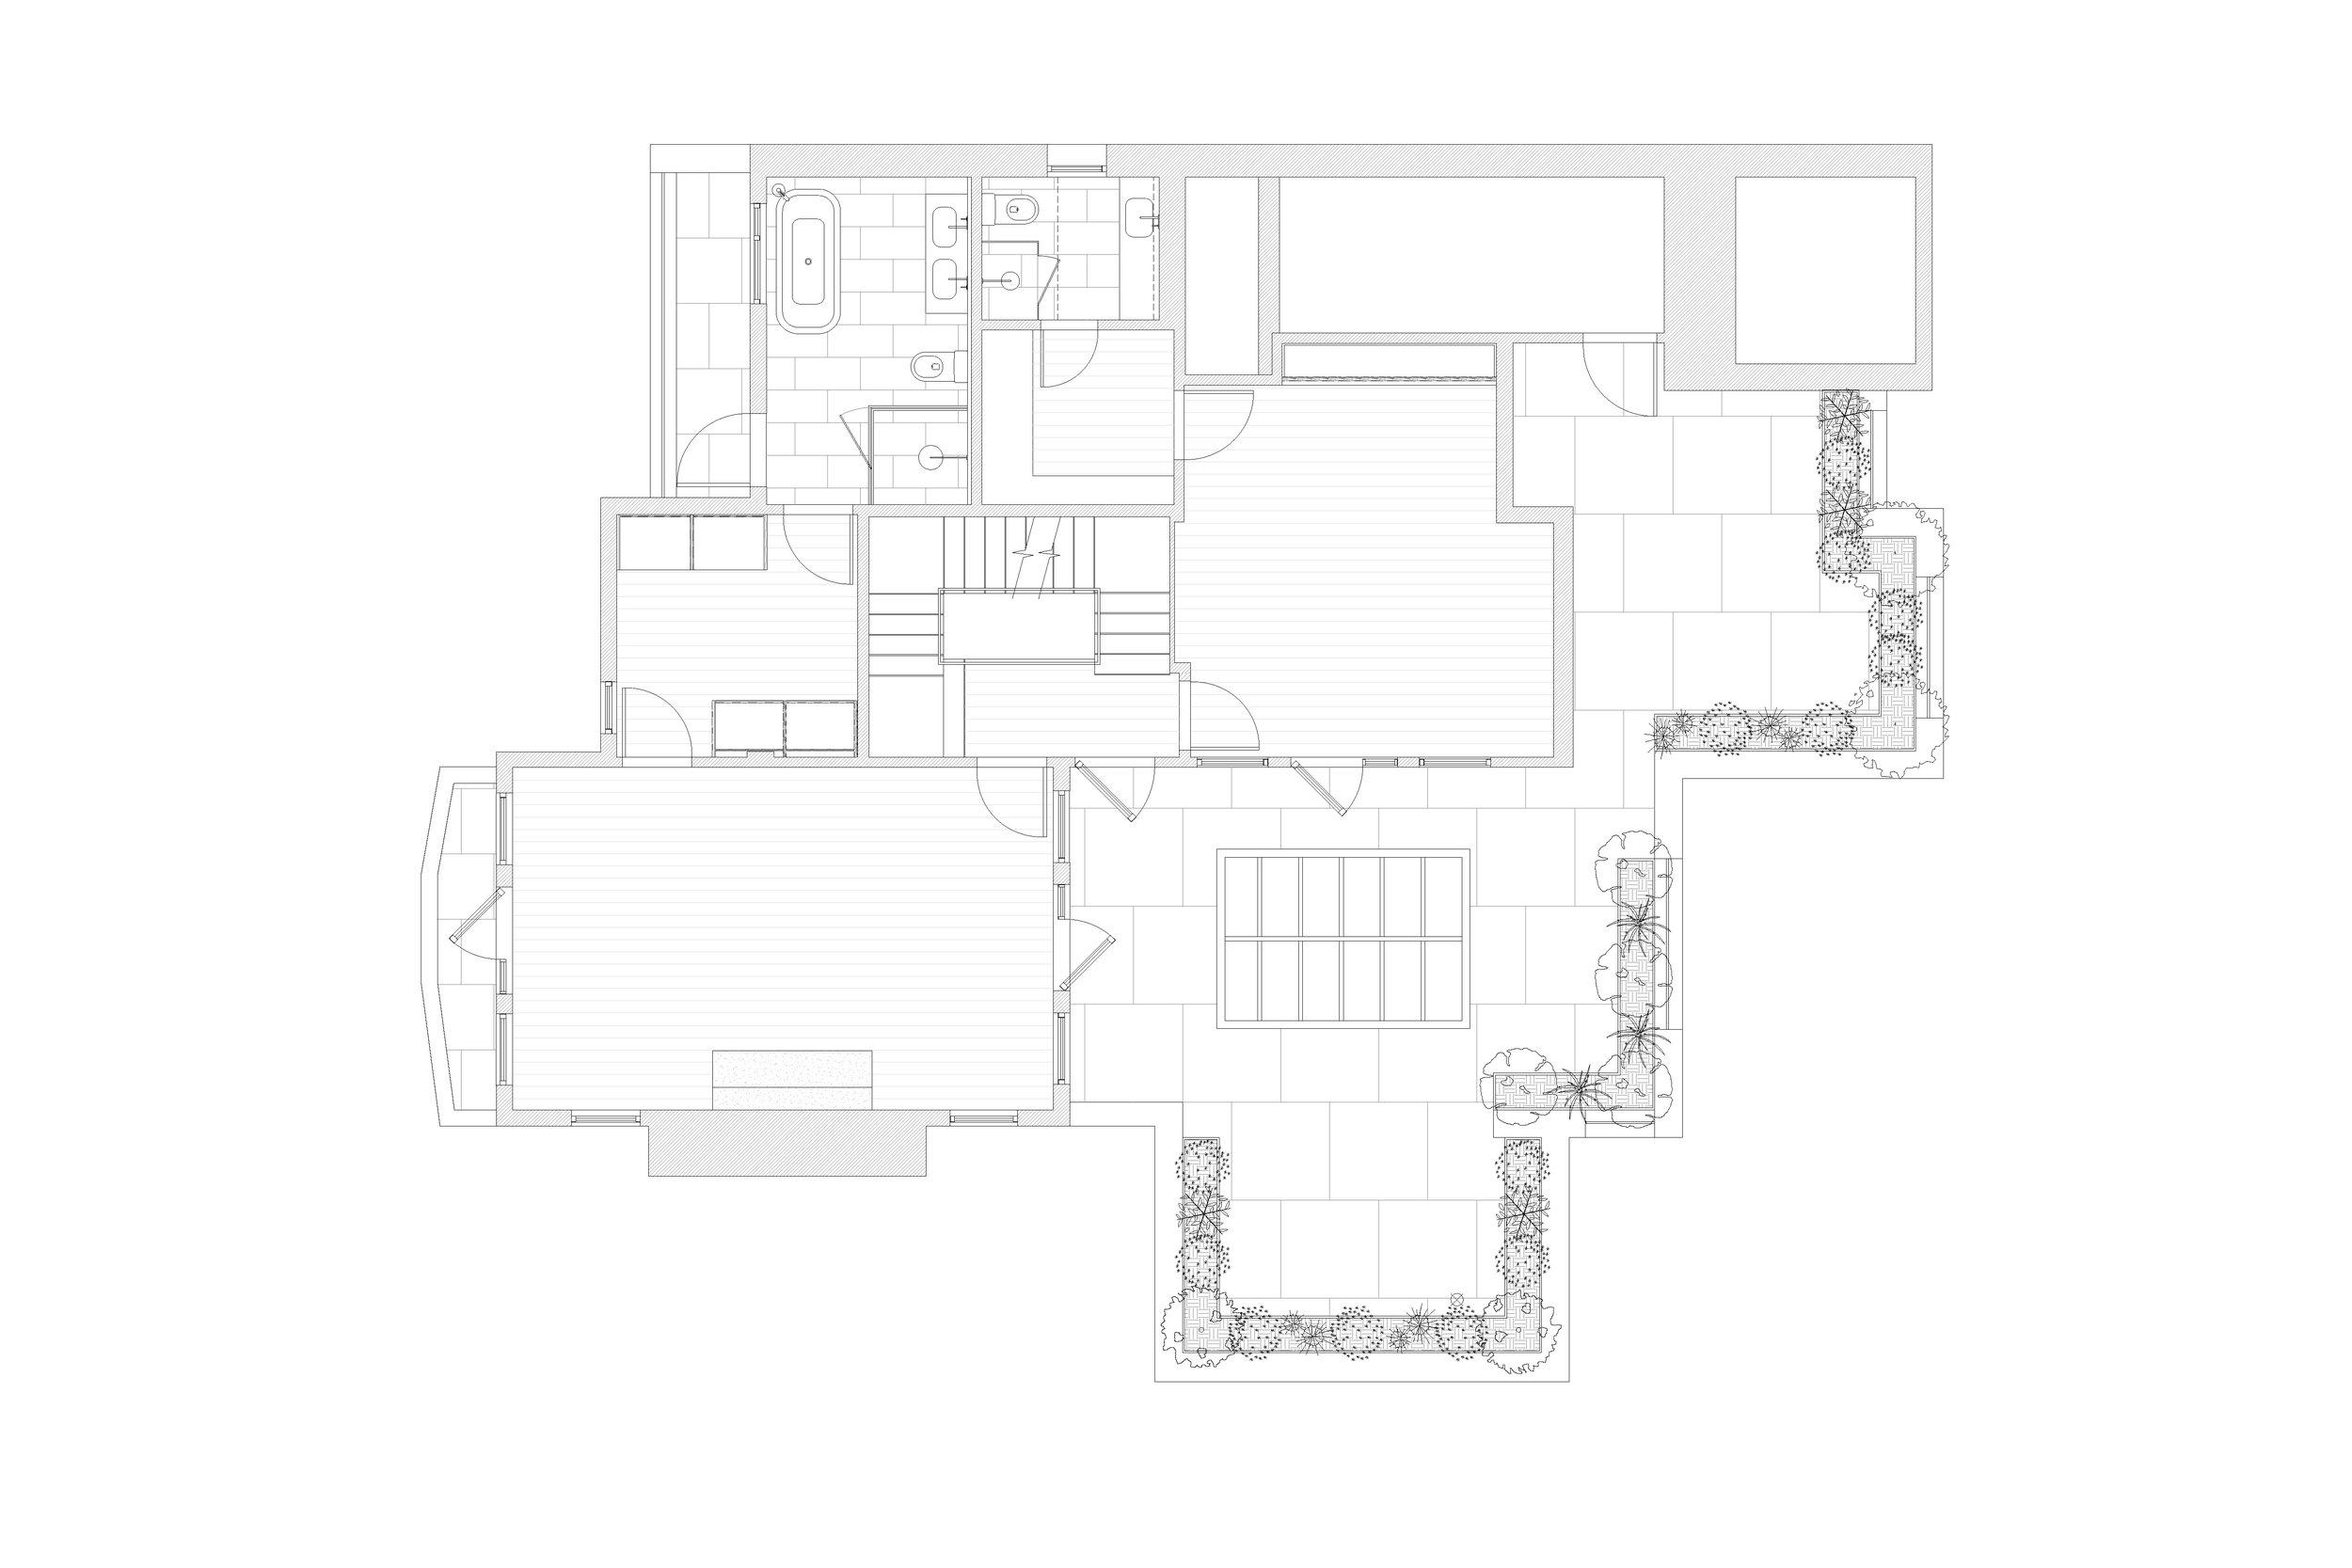 LEO.AFF.PLANS_PRESENTATION-Layout2.jpg